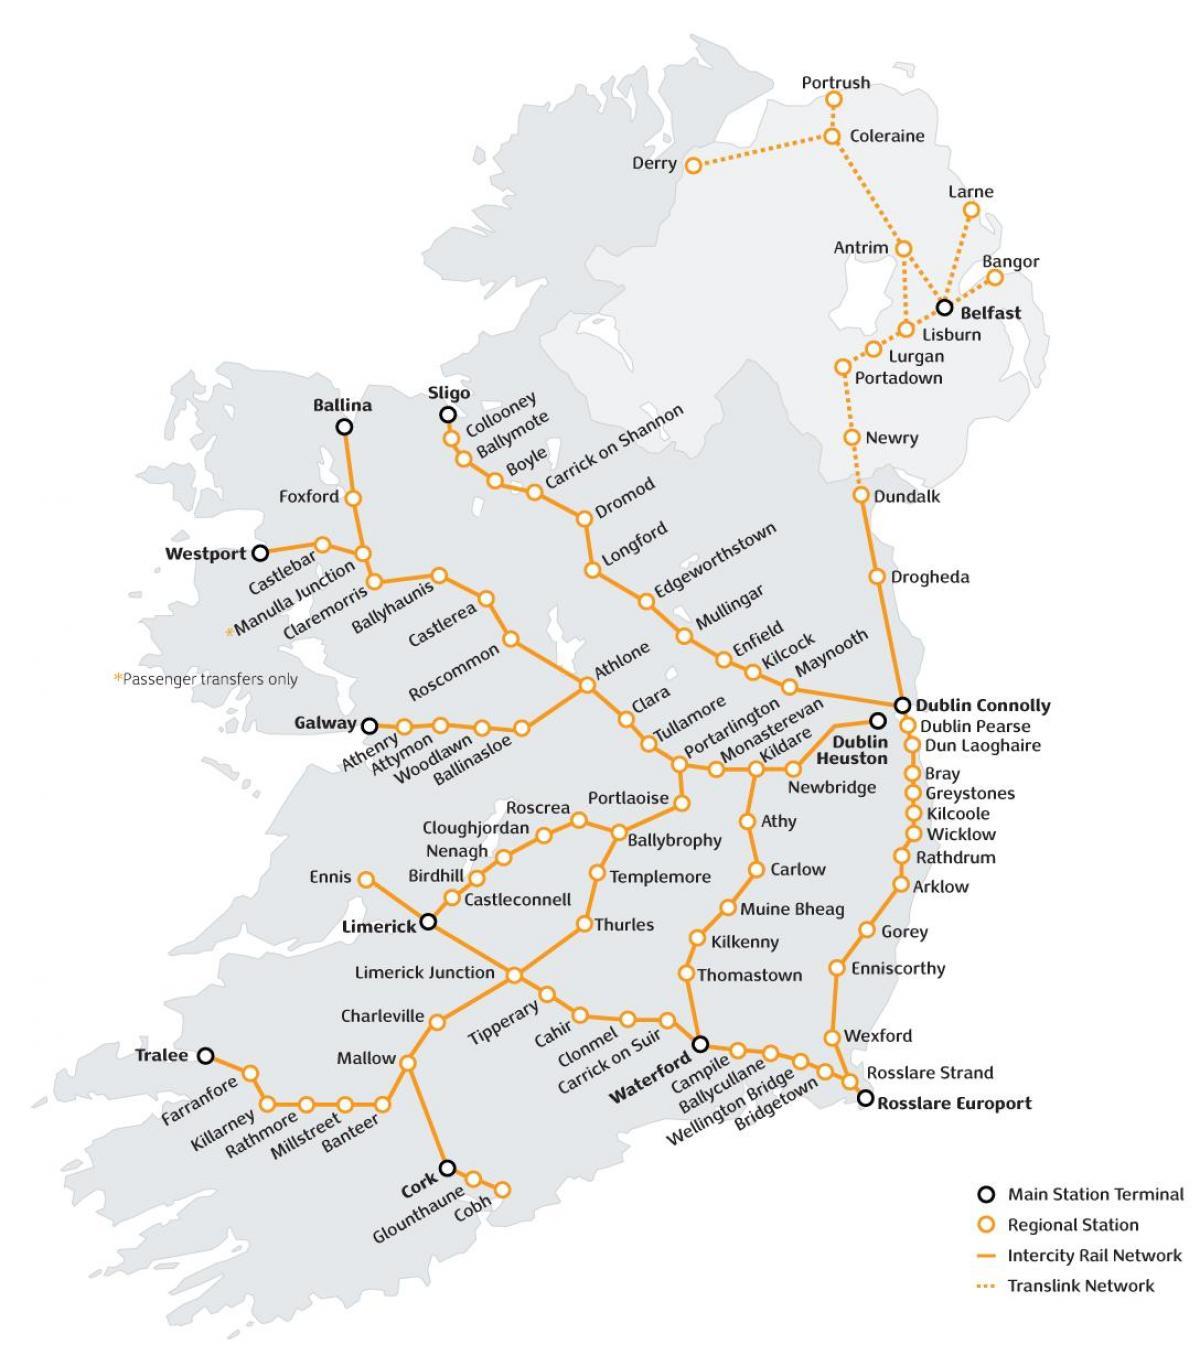 Train Travel In Ireland Map.Ireland Train Map Train Travel In Ireland Map Northern Europe